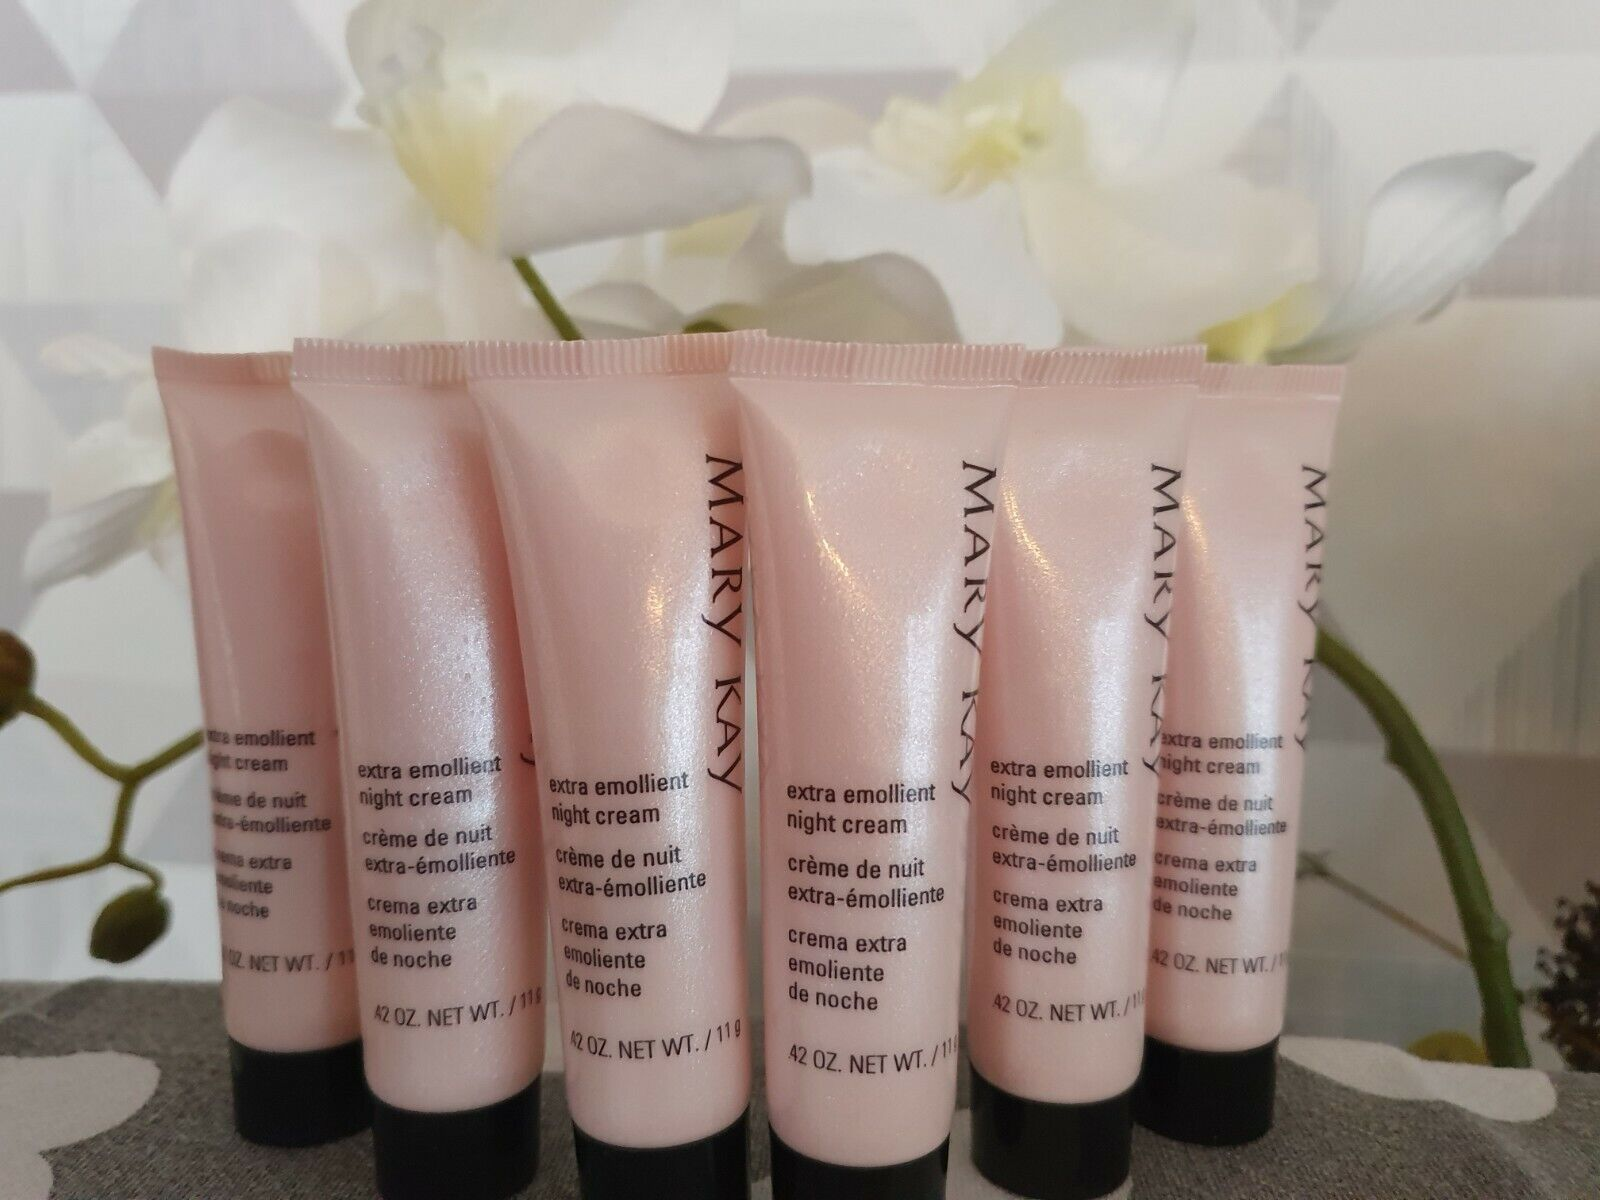 Mary Kay Extra Emollient Night Cream SOS Creme NEU,11g x 6 st.(bis 022023)